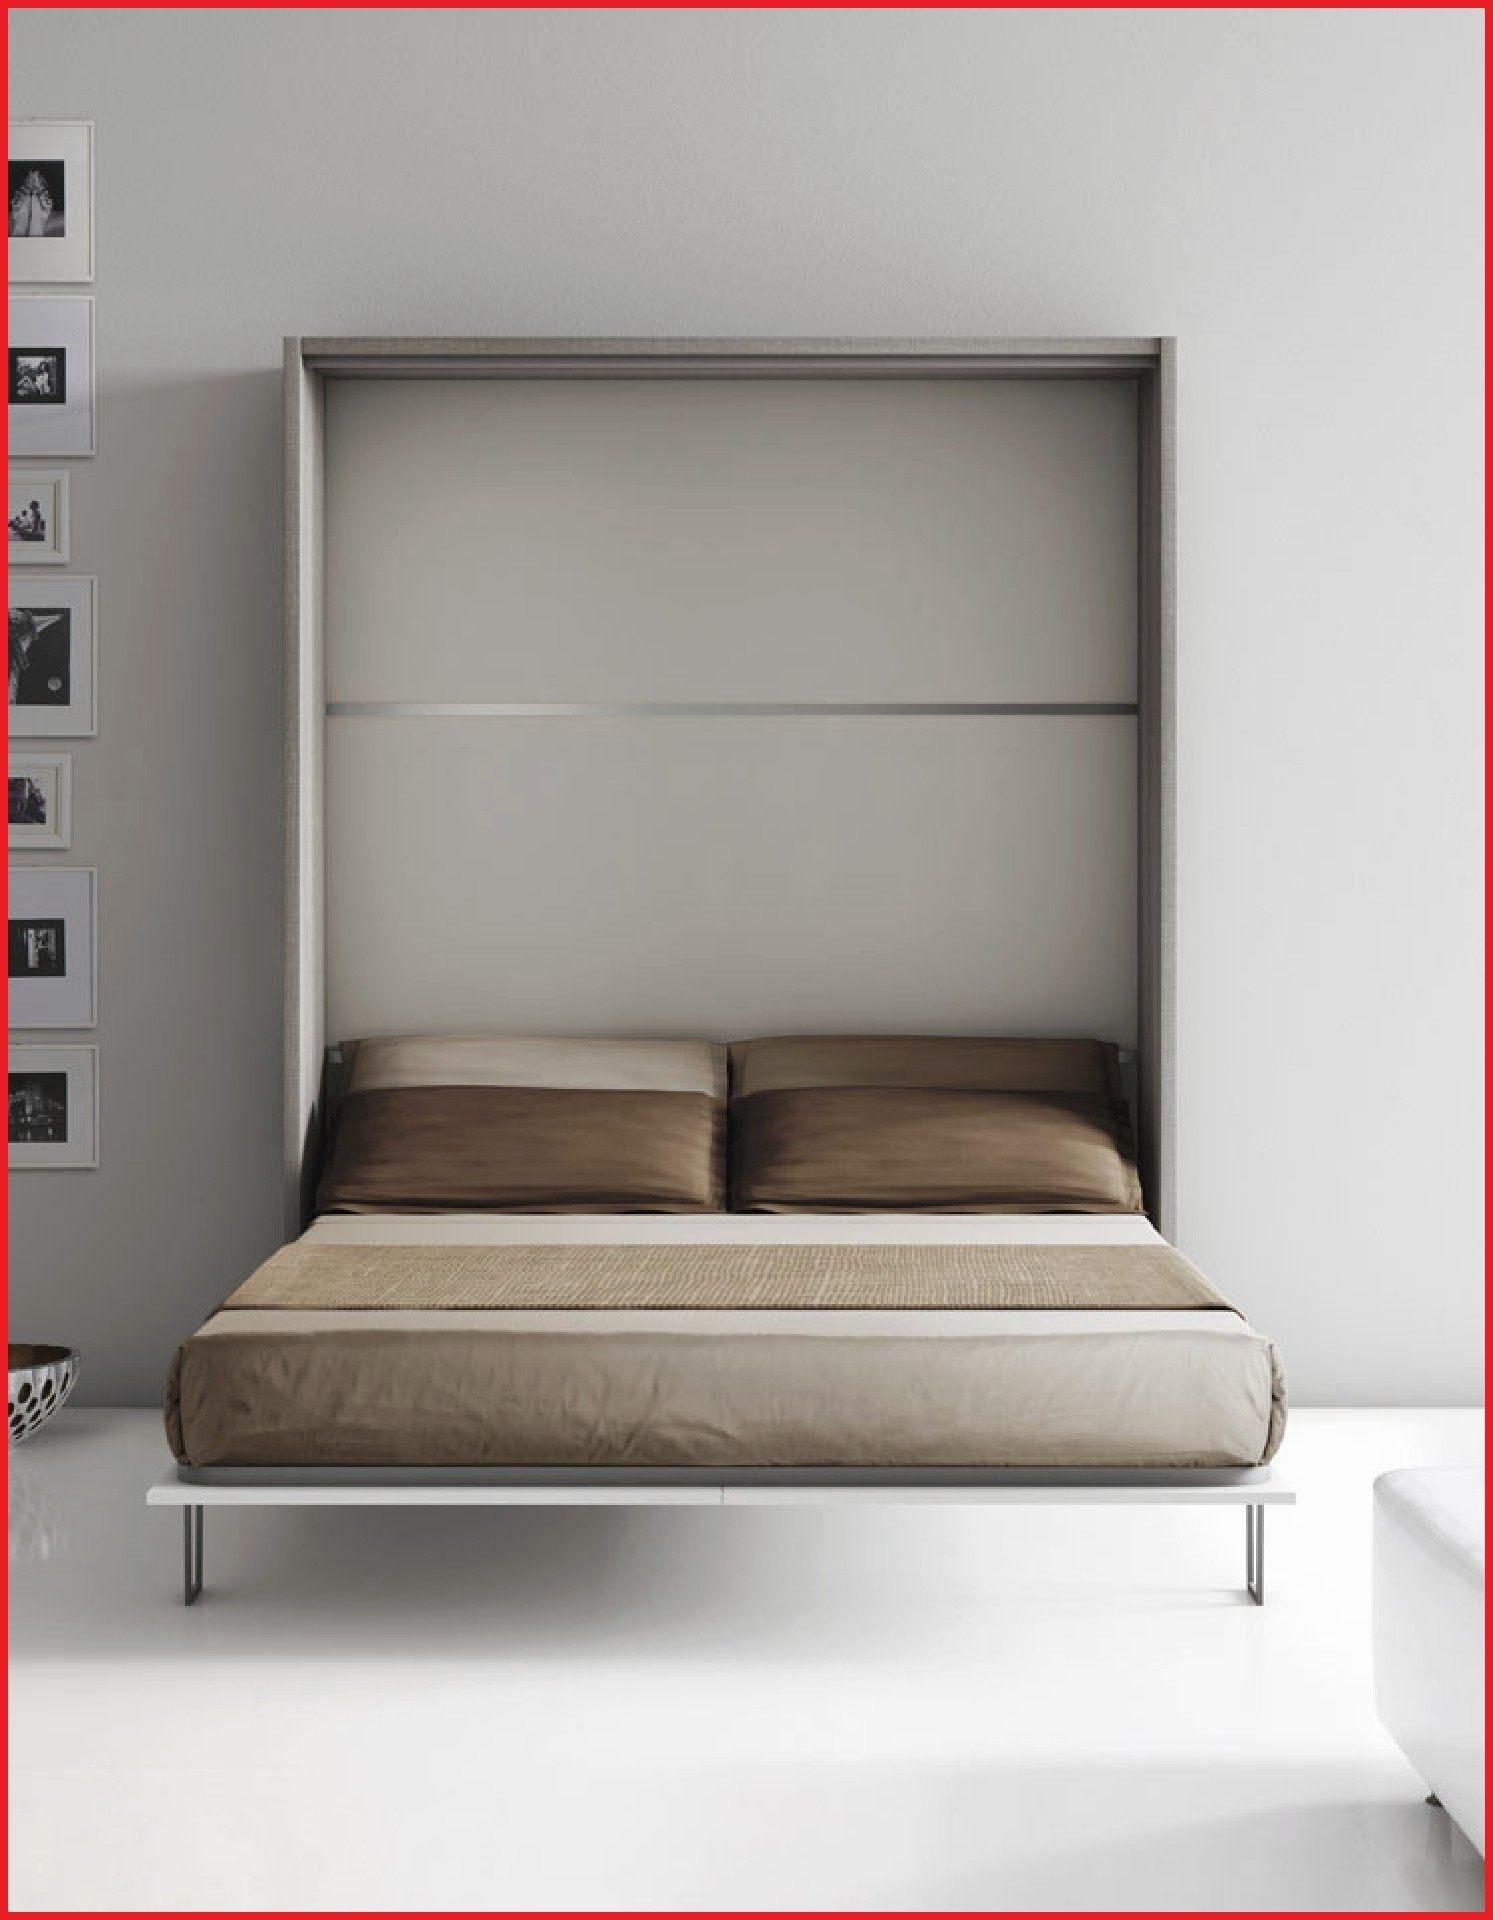 Impressionnant Lit Armoire Escamotable Ikea Ou Armoire Lit